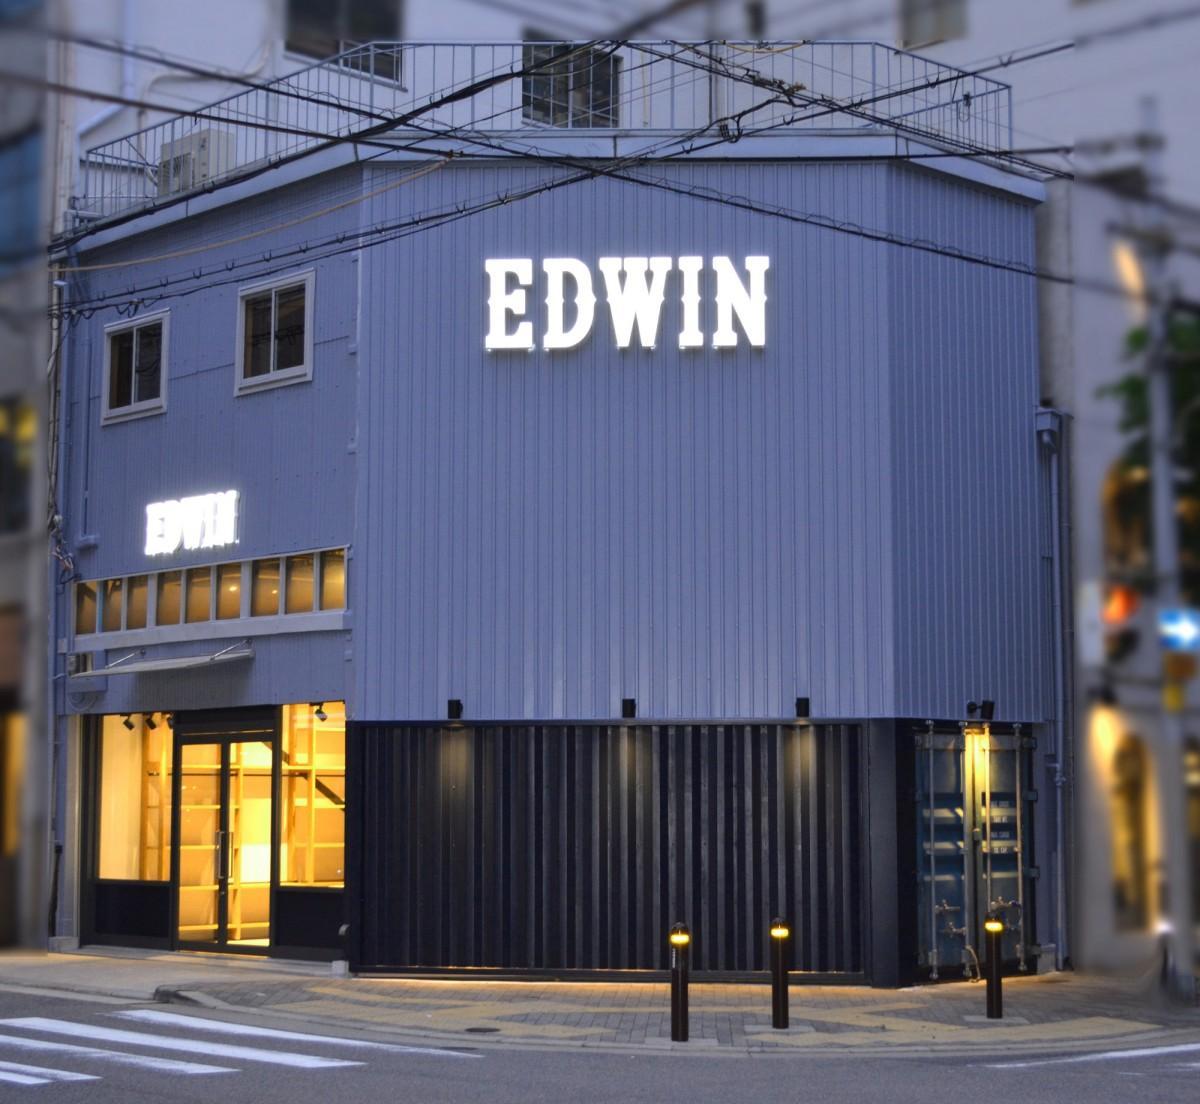 「EDWIN MINAMI HORIE」の外観(夜)